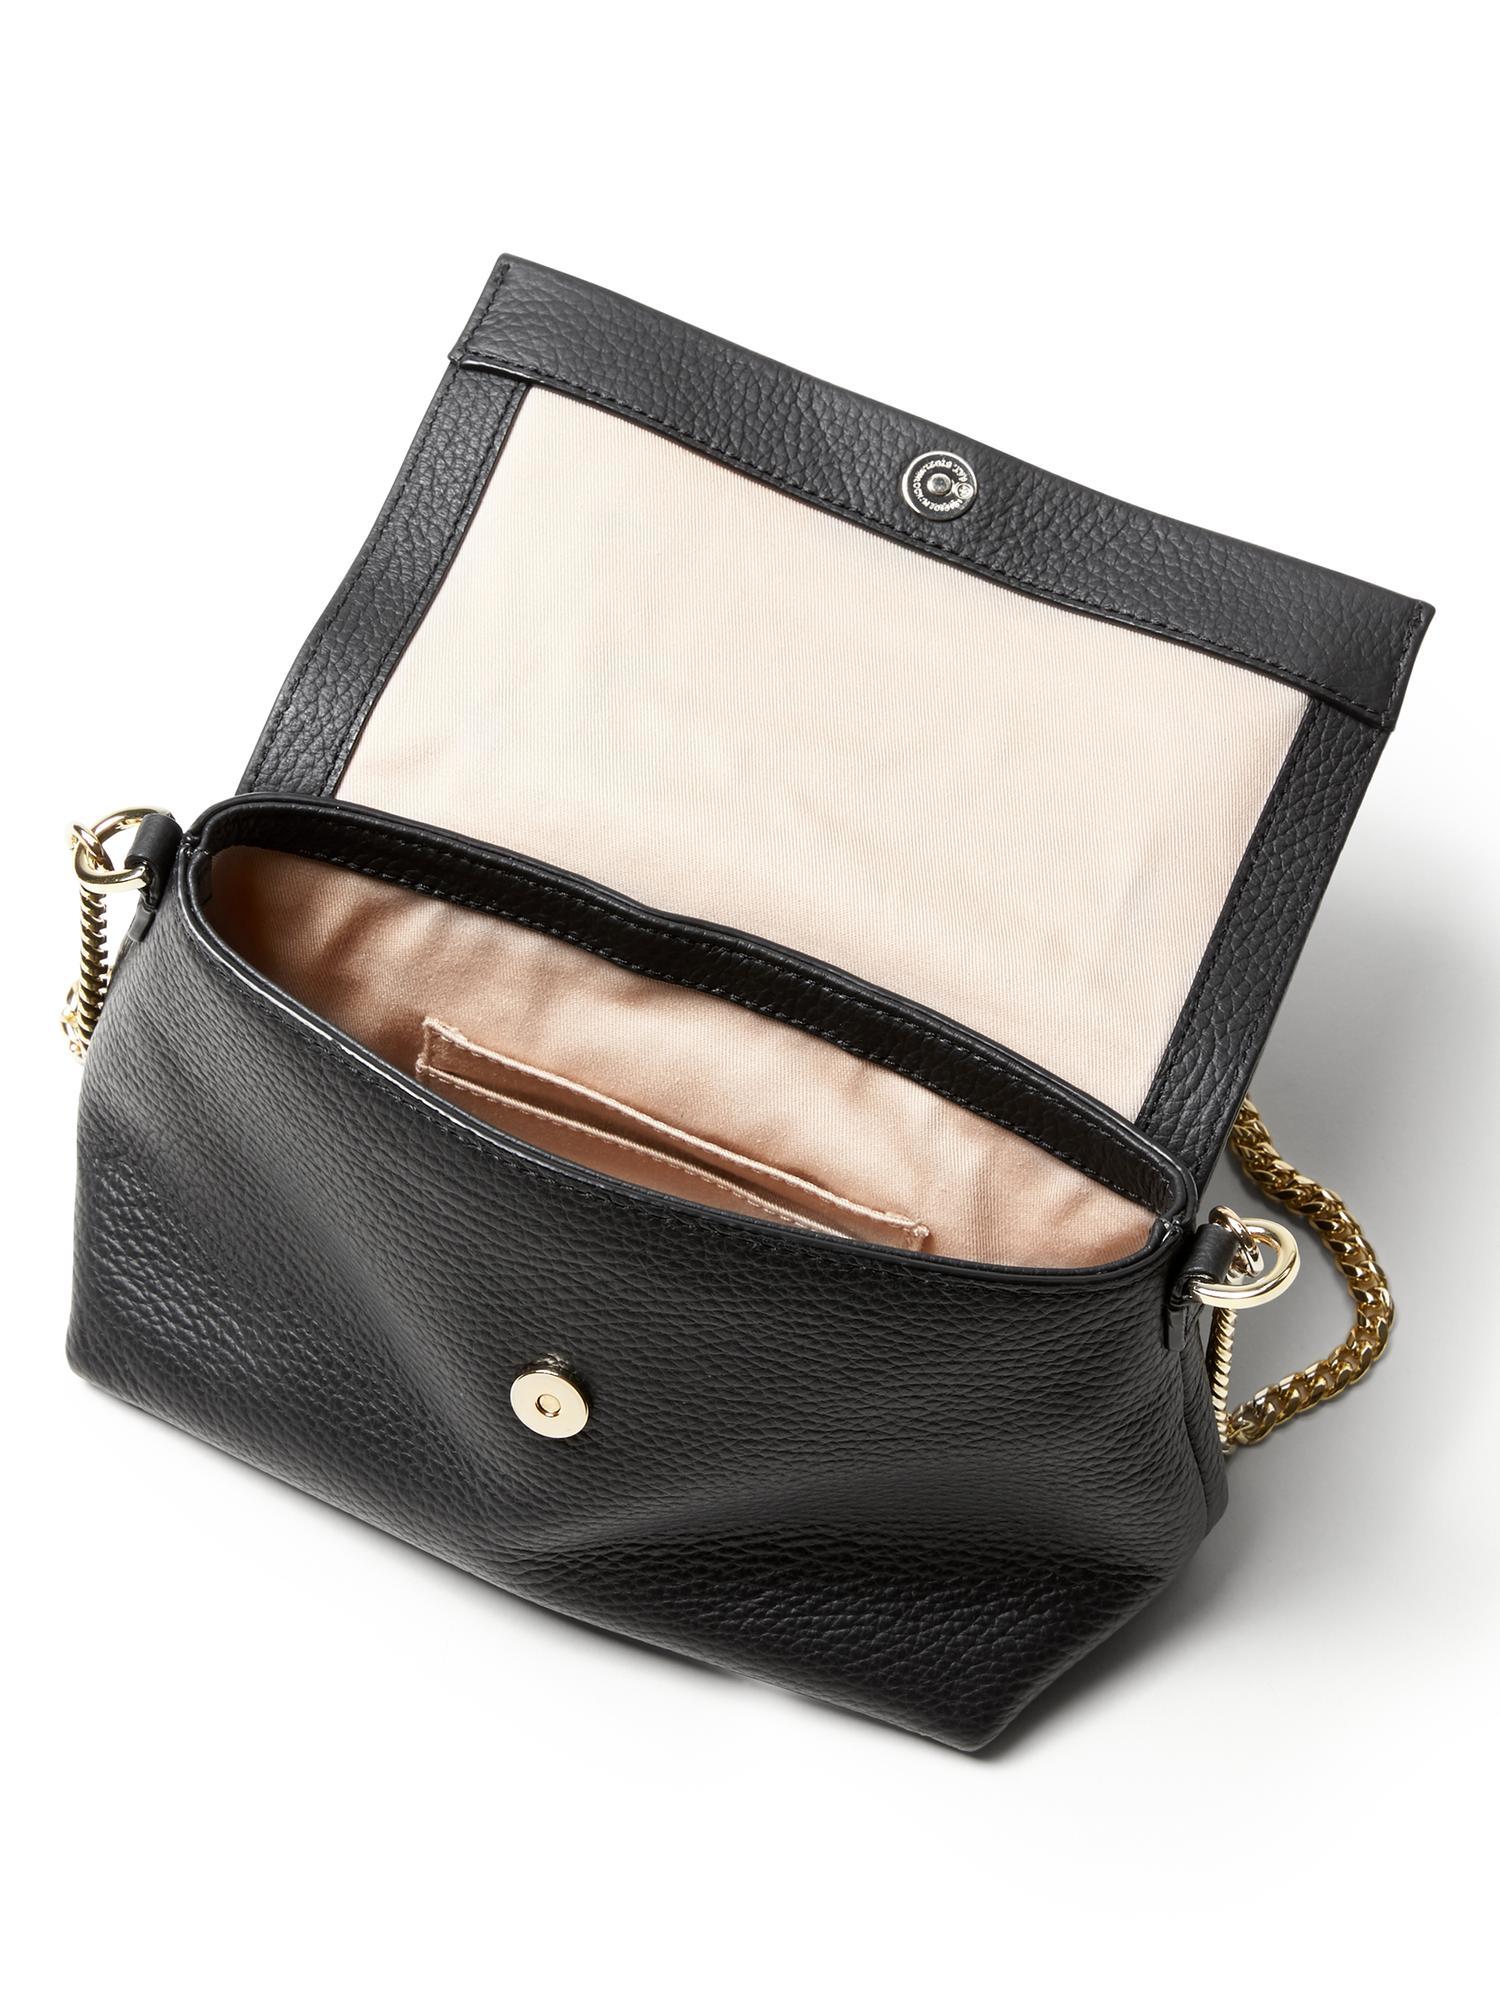 1fb35e3996be Lyst - Banana Republic Italian Leather Chain Bag in Black